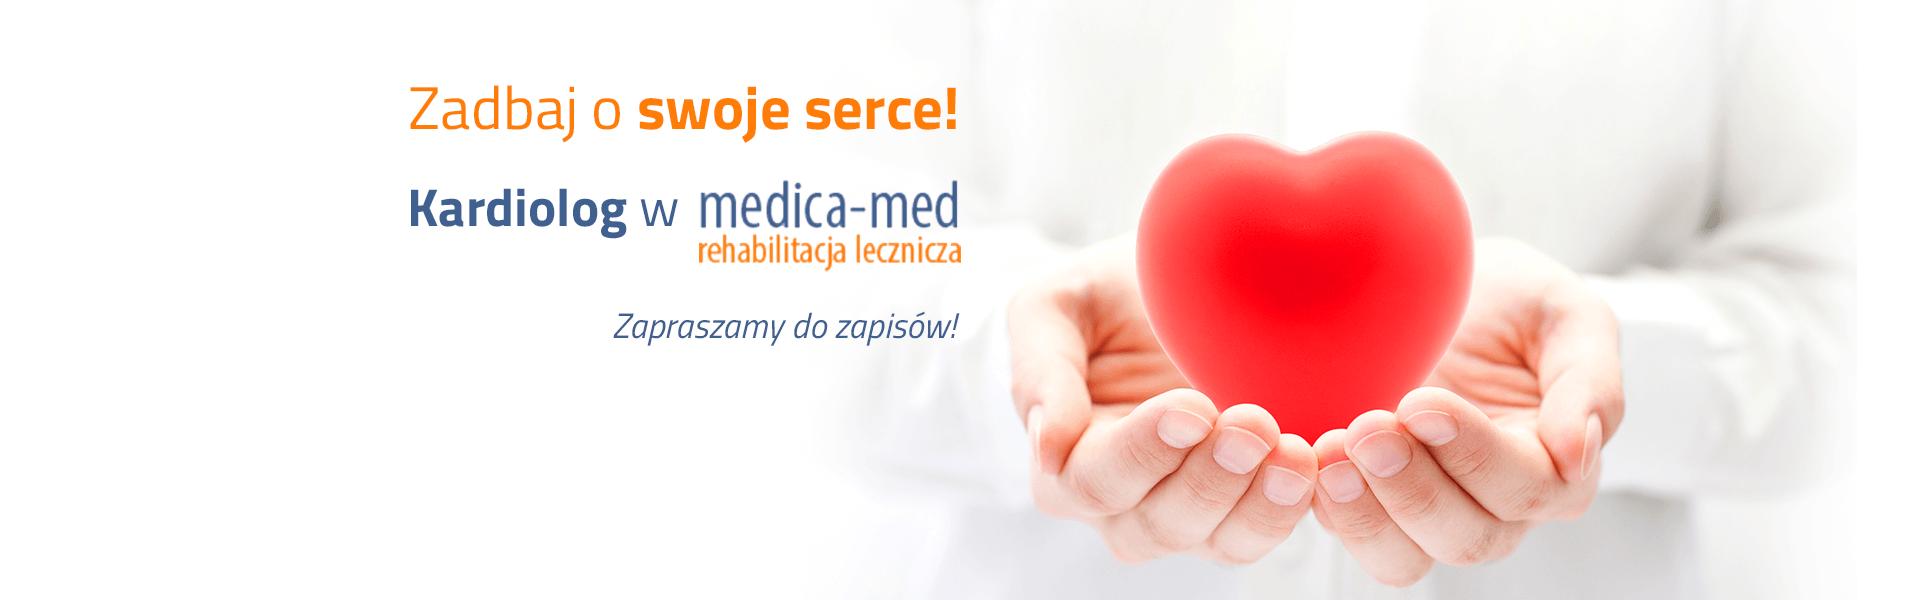 Medicamed-Zadbaj-o-swoje-serce!-slider